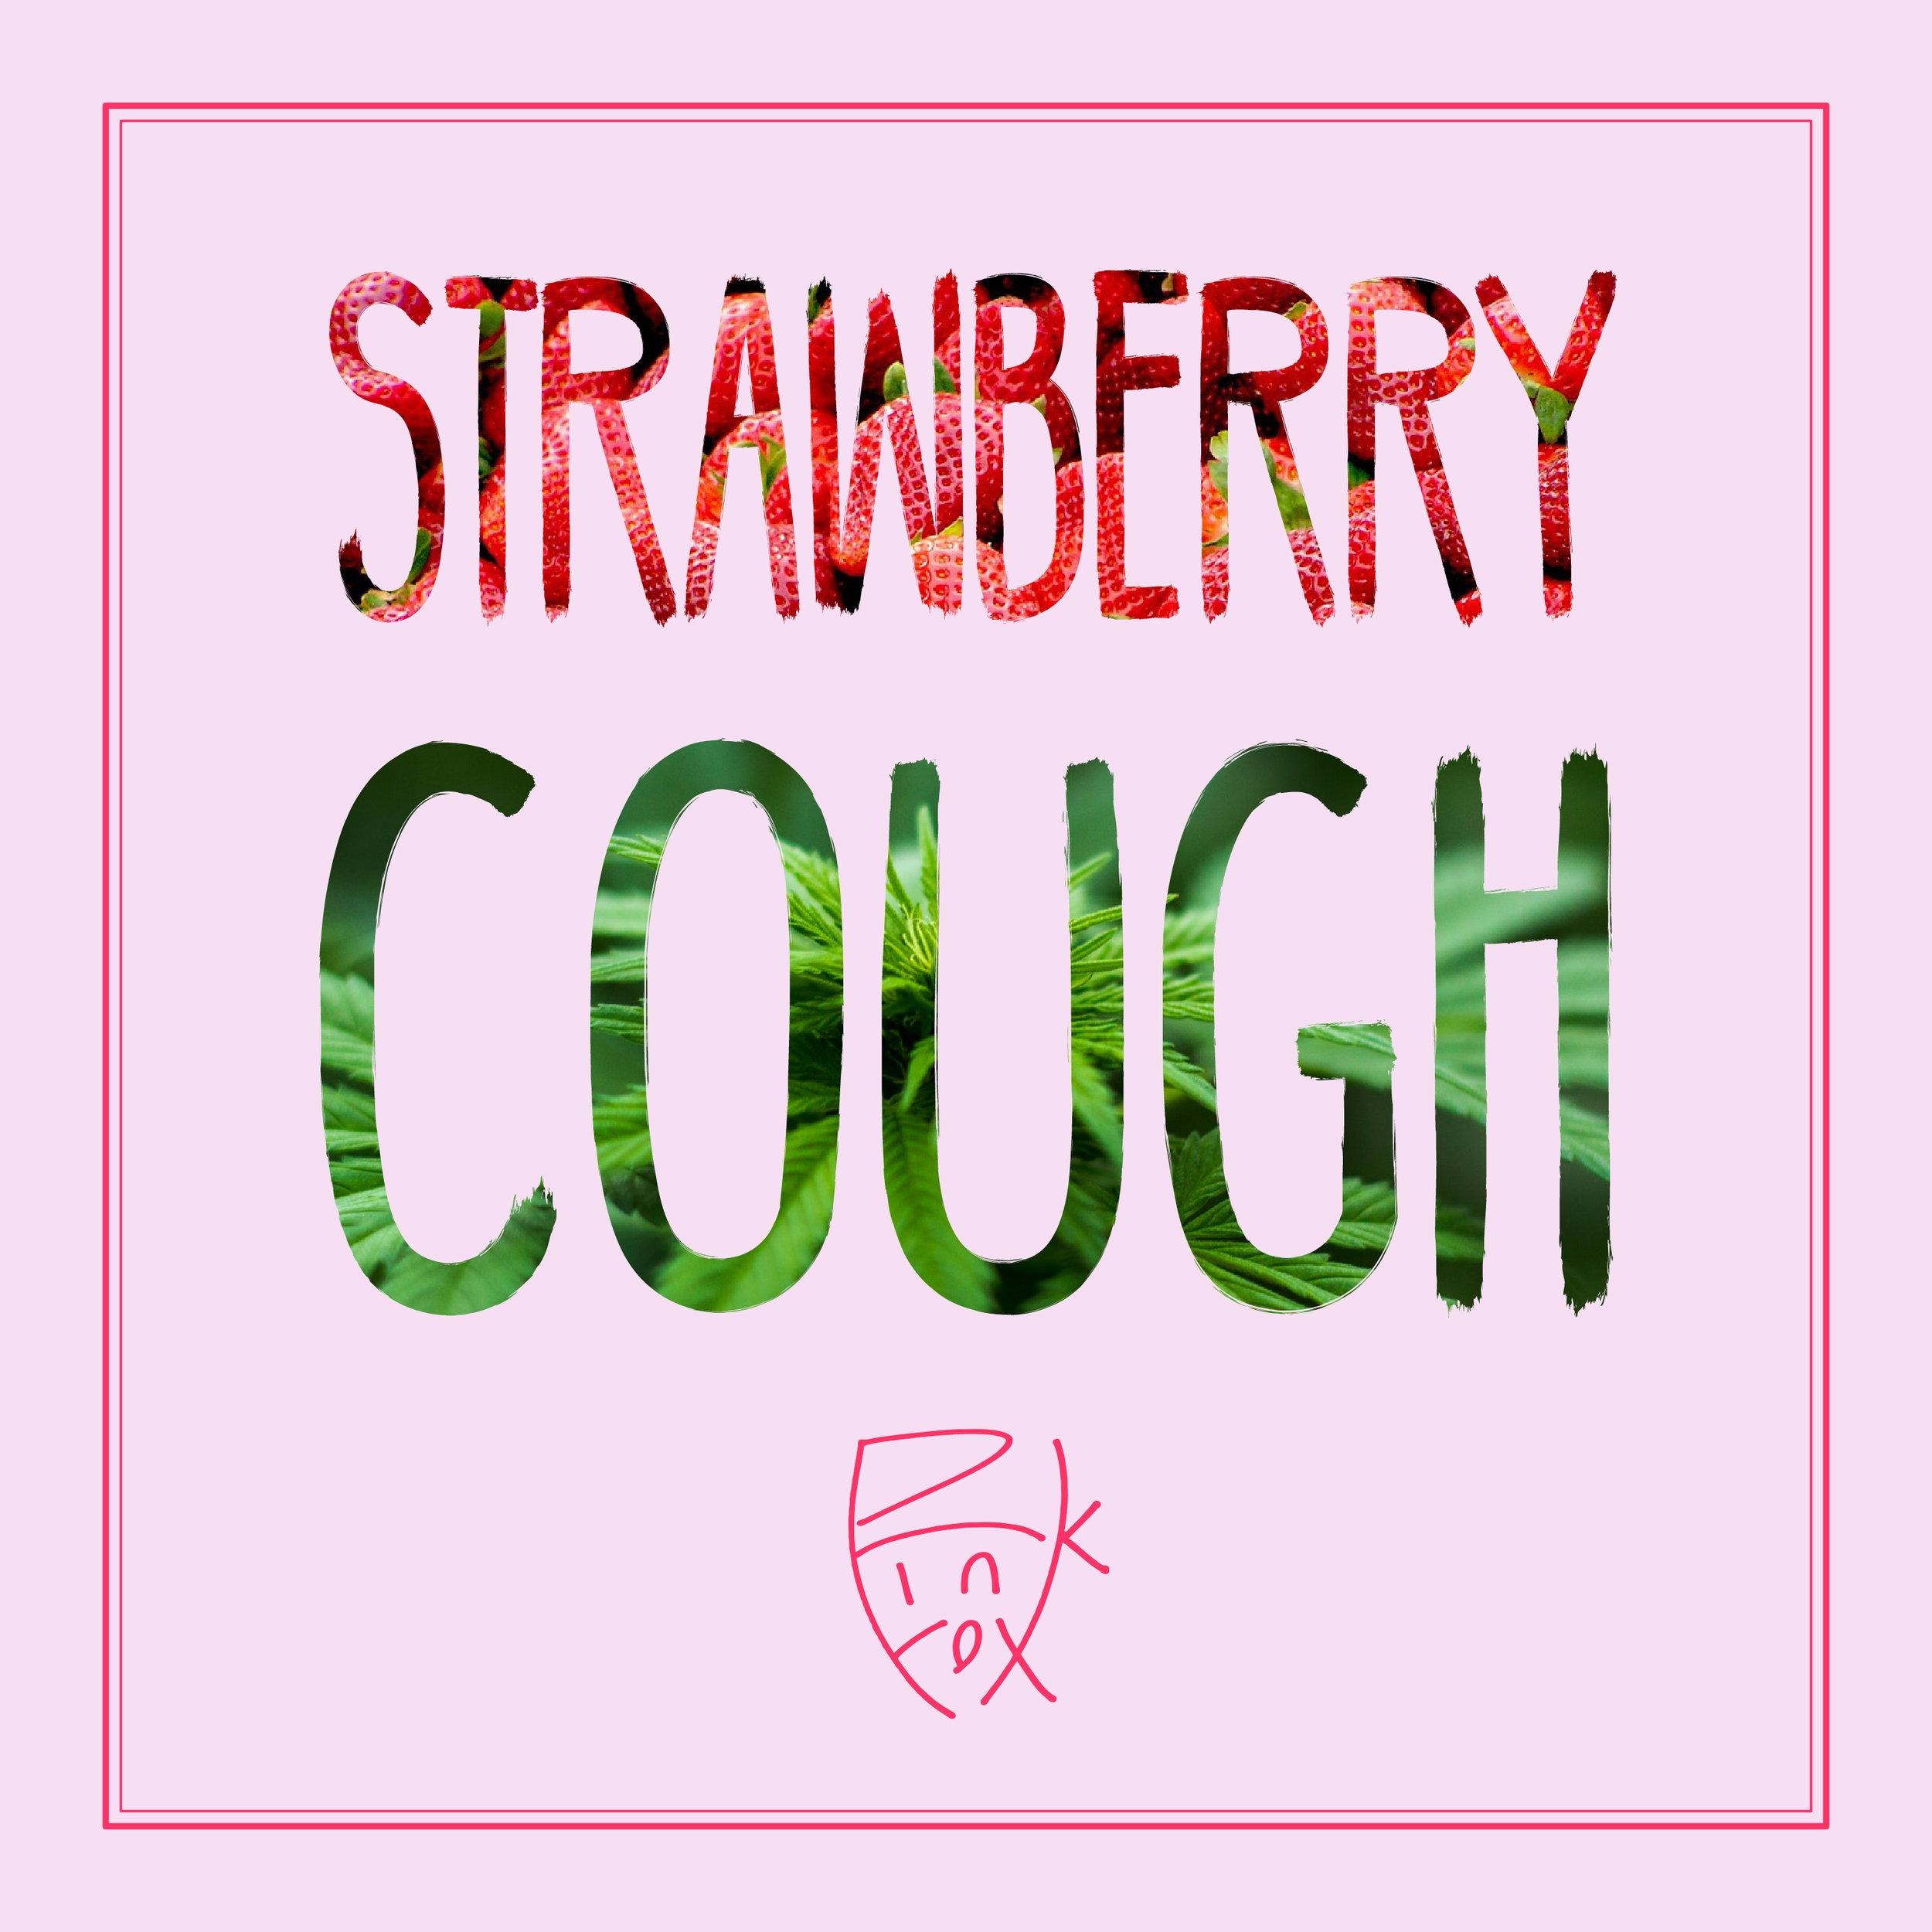 strawberrycough6-01.jpg